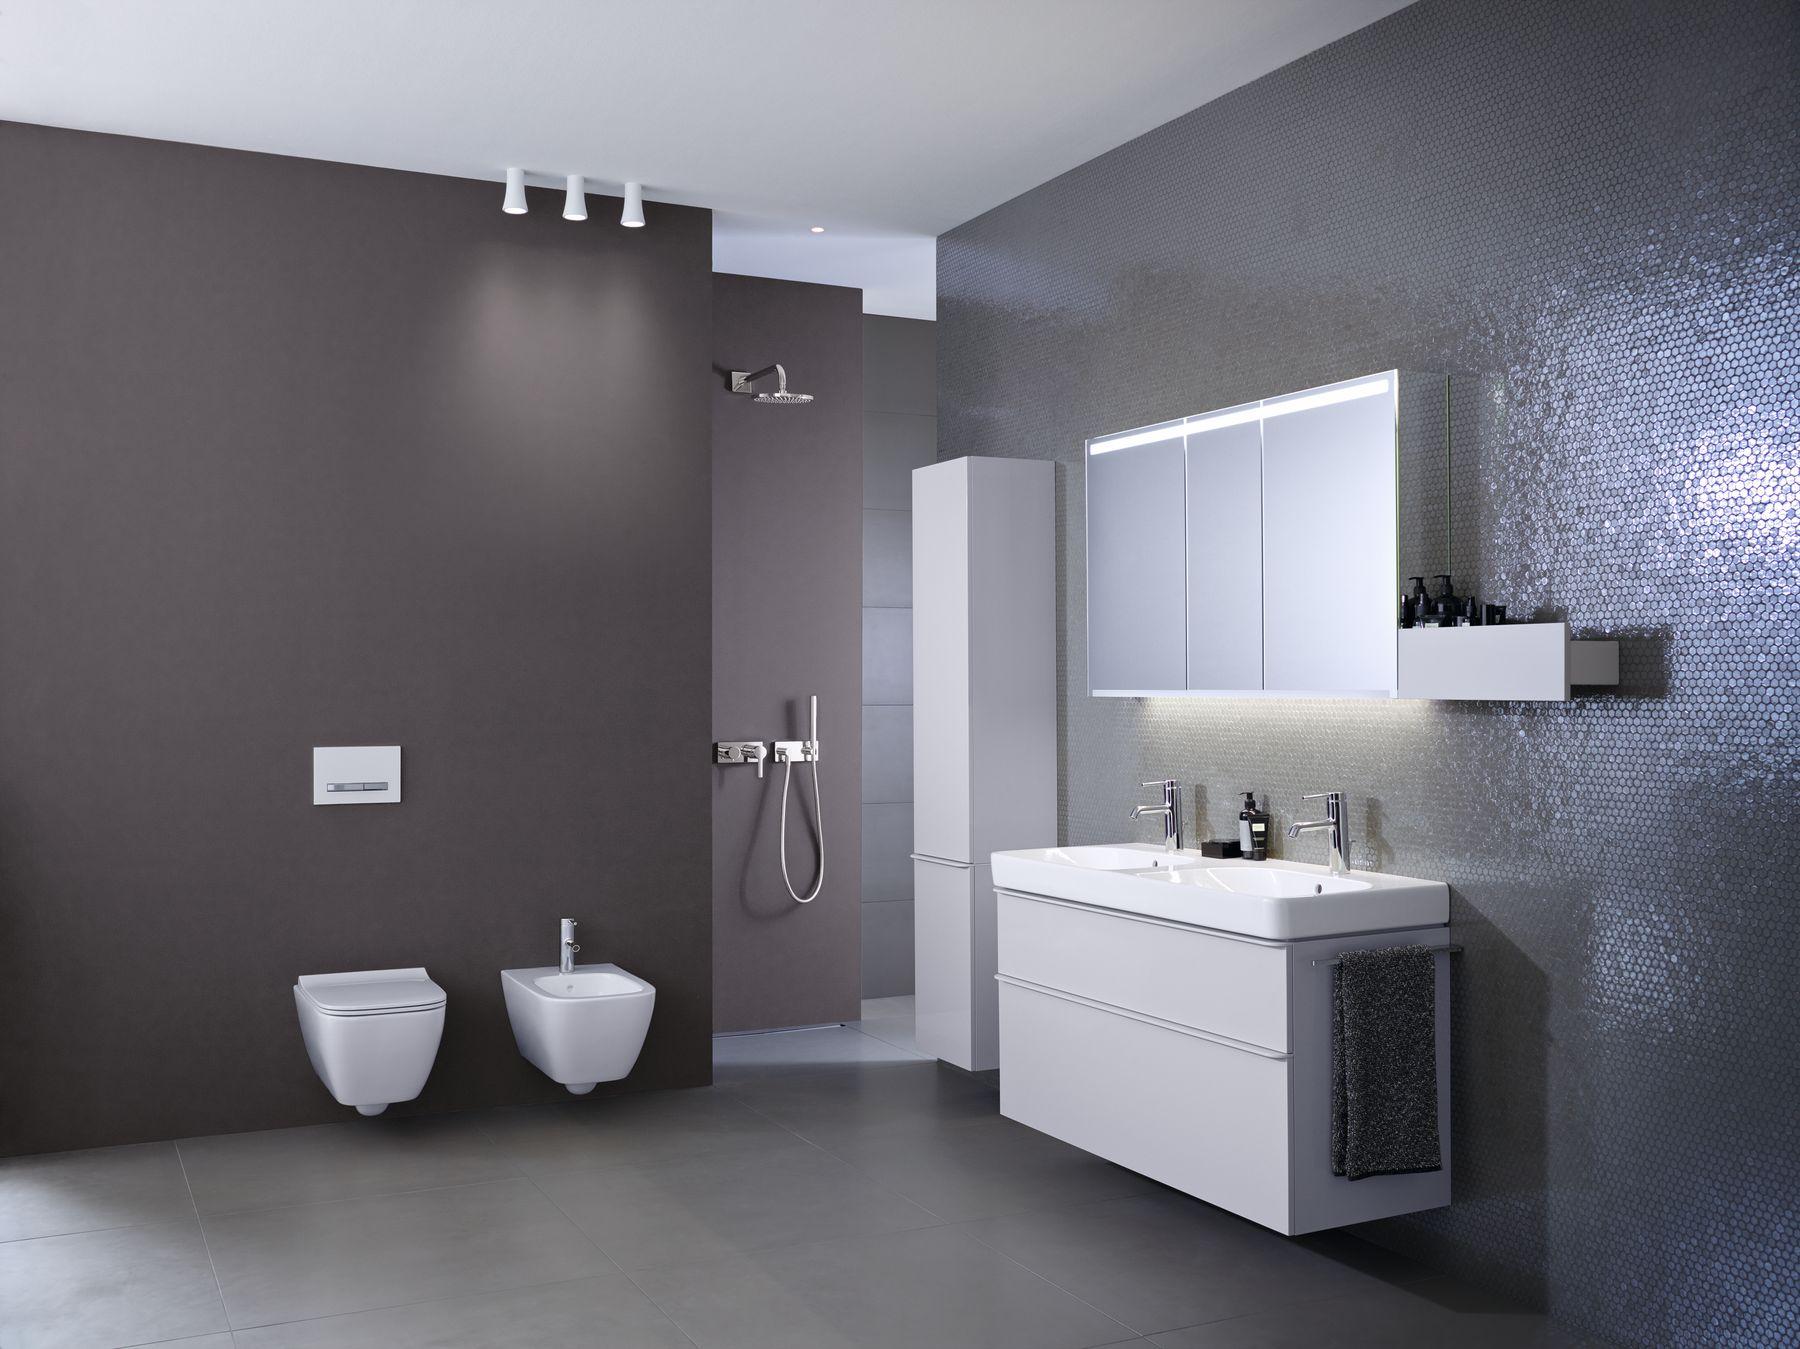 Obr.1_2019 Bathroom 07 L Smyle wall brown_Original